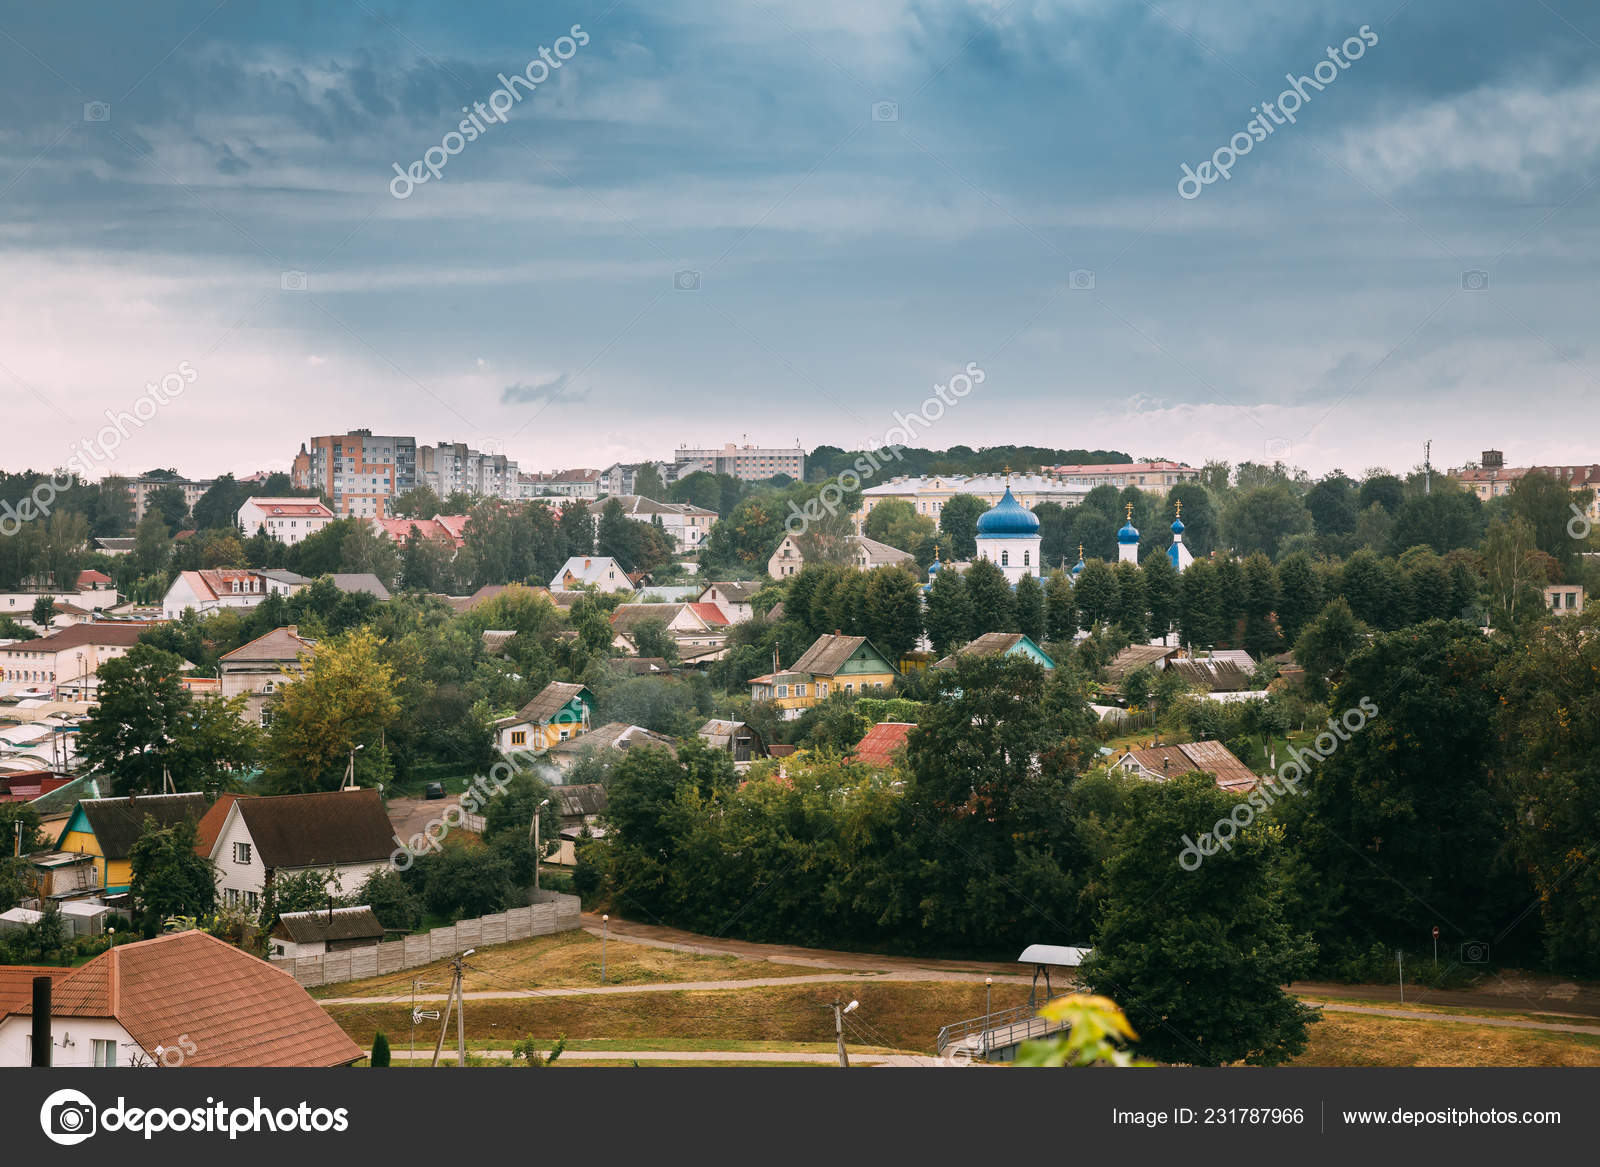 фото города могилев